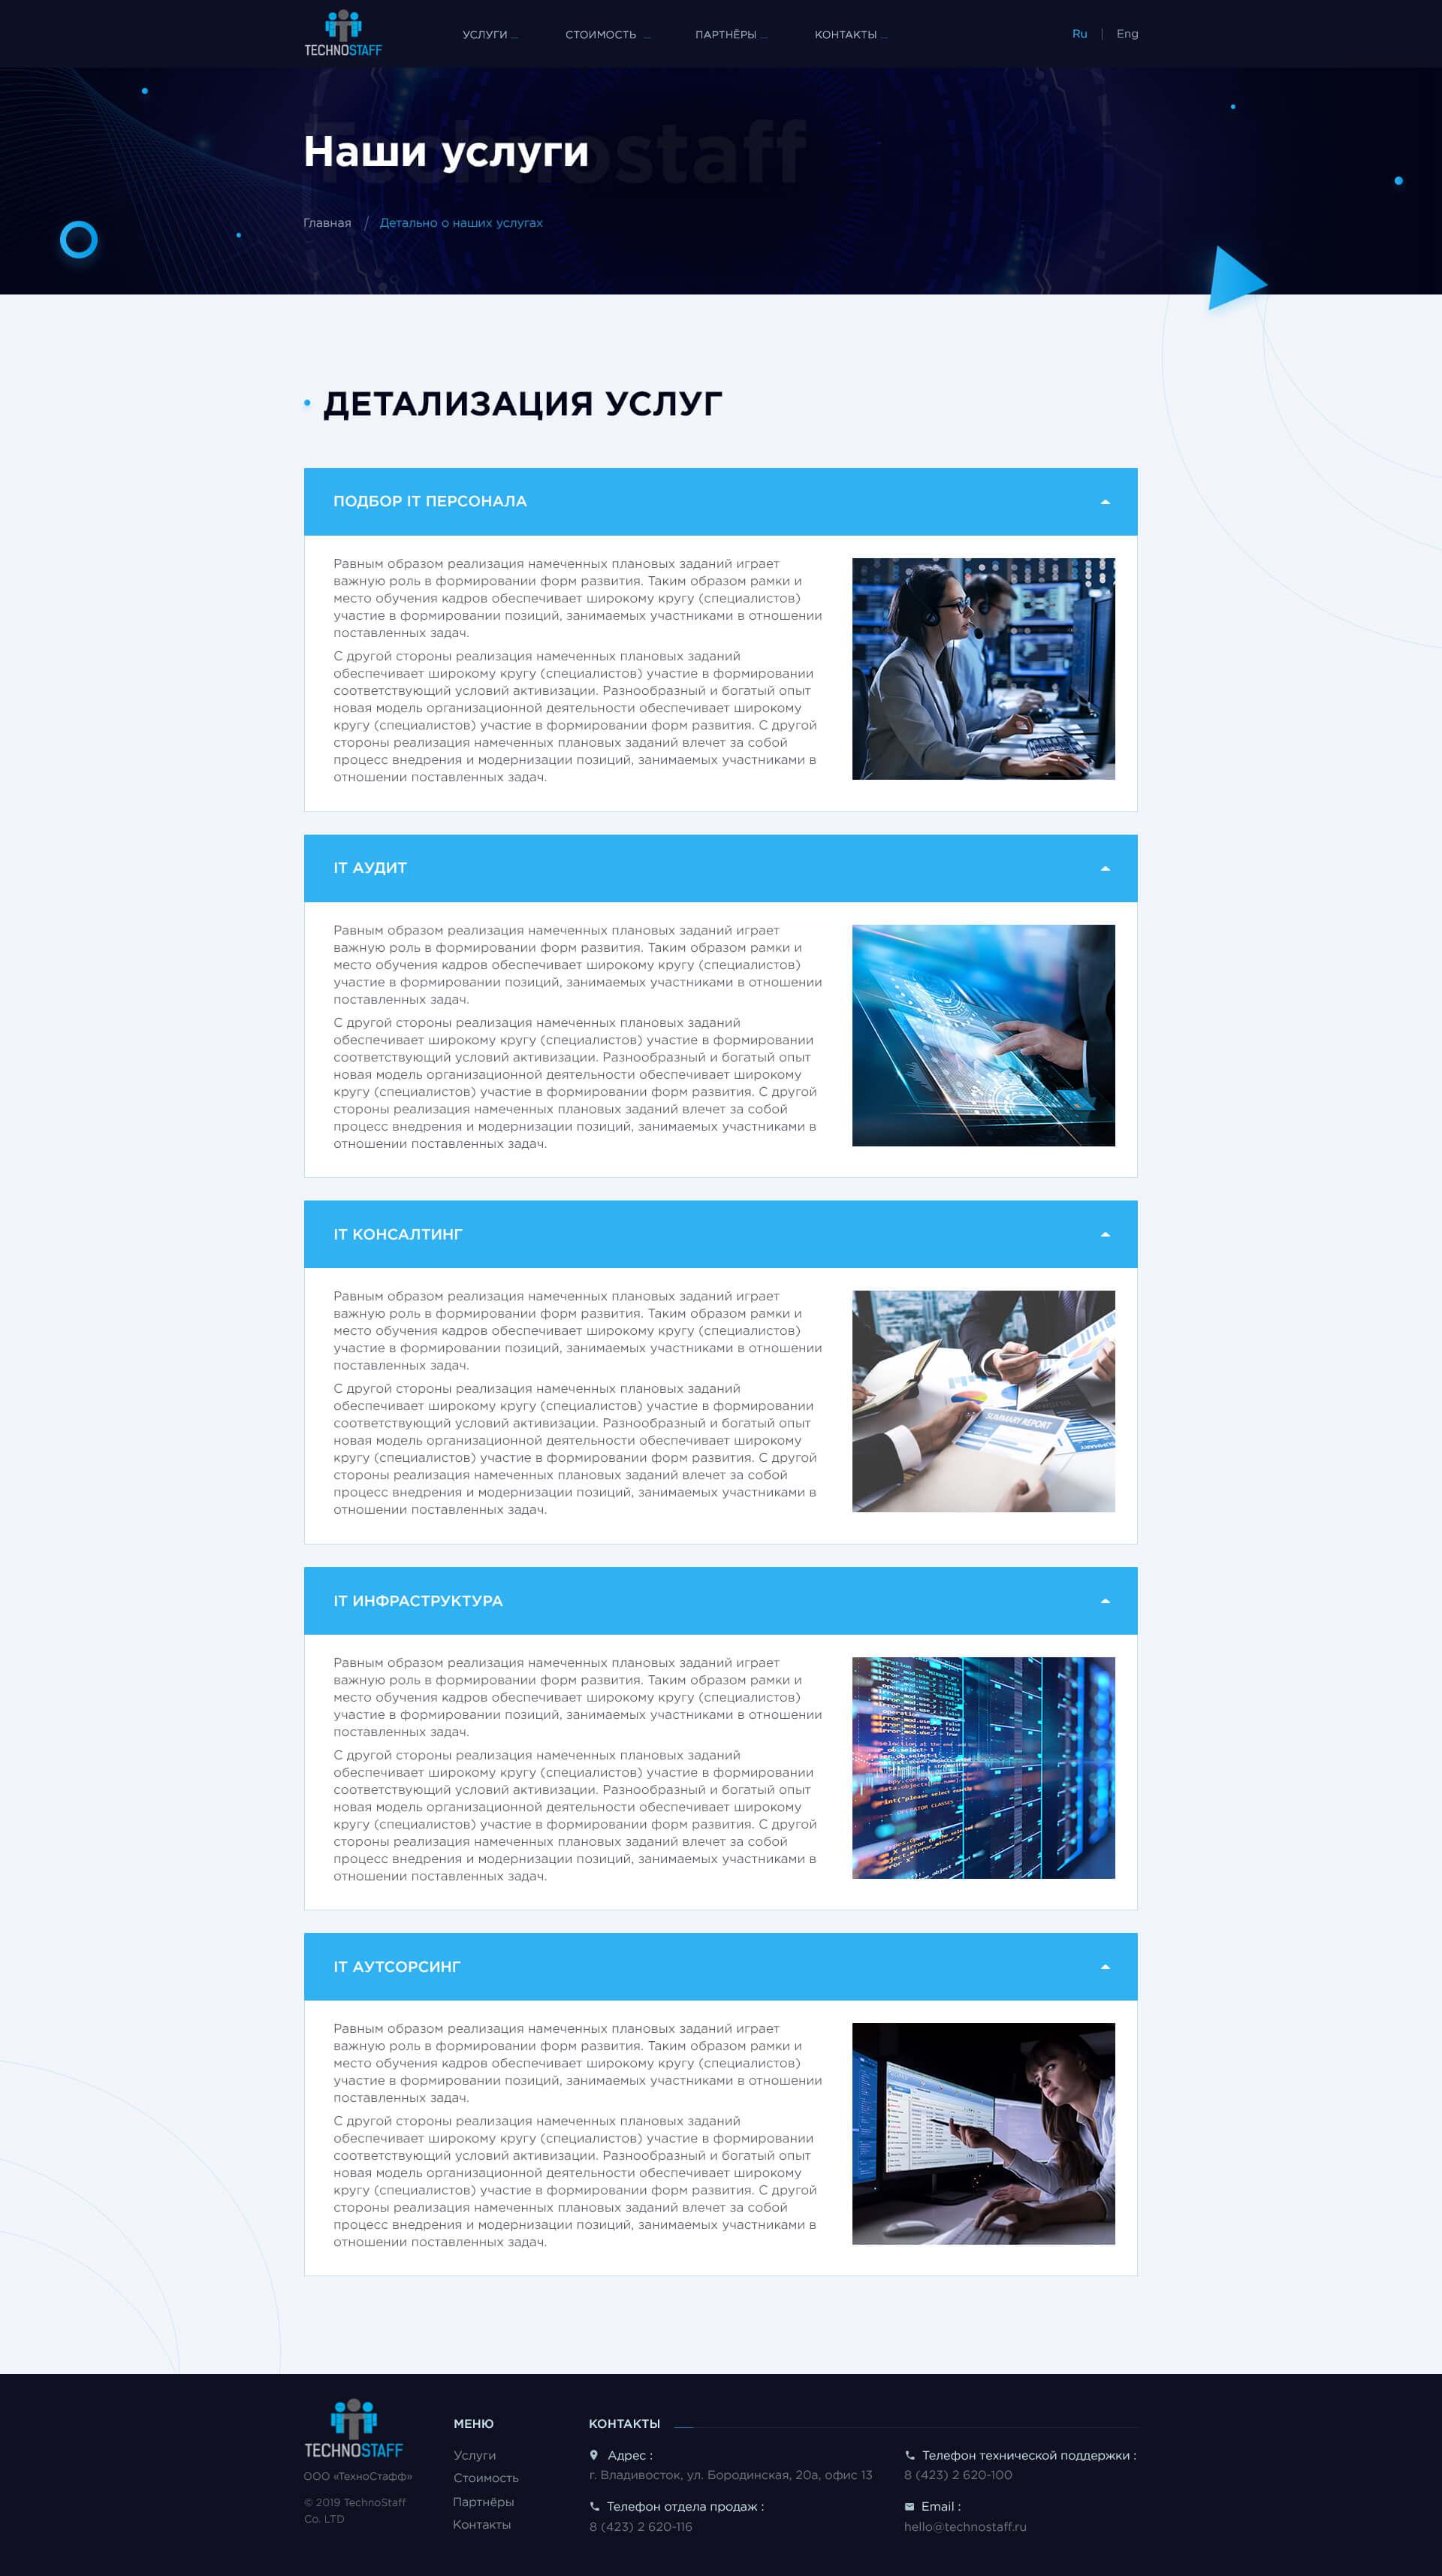 Technostaff_Services_1.1